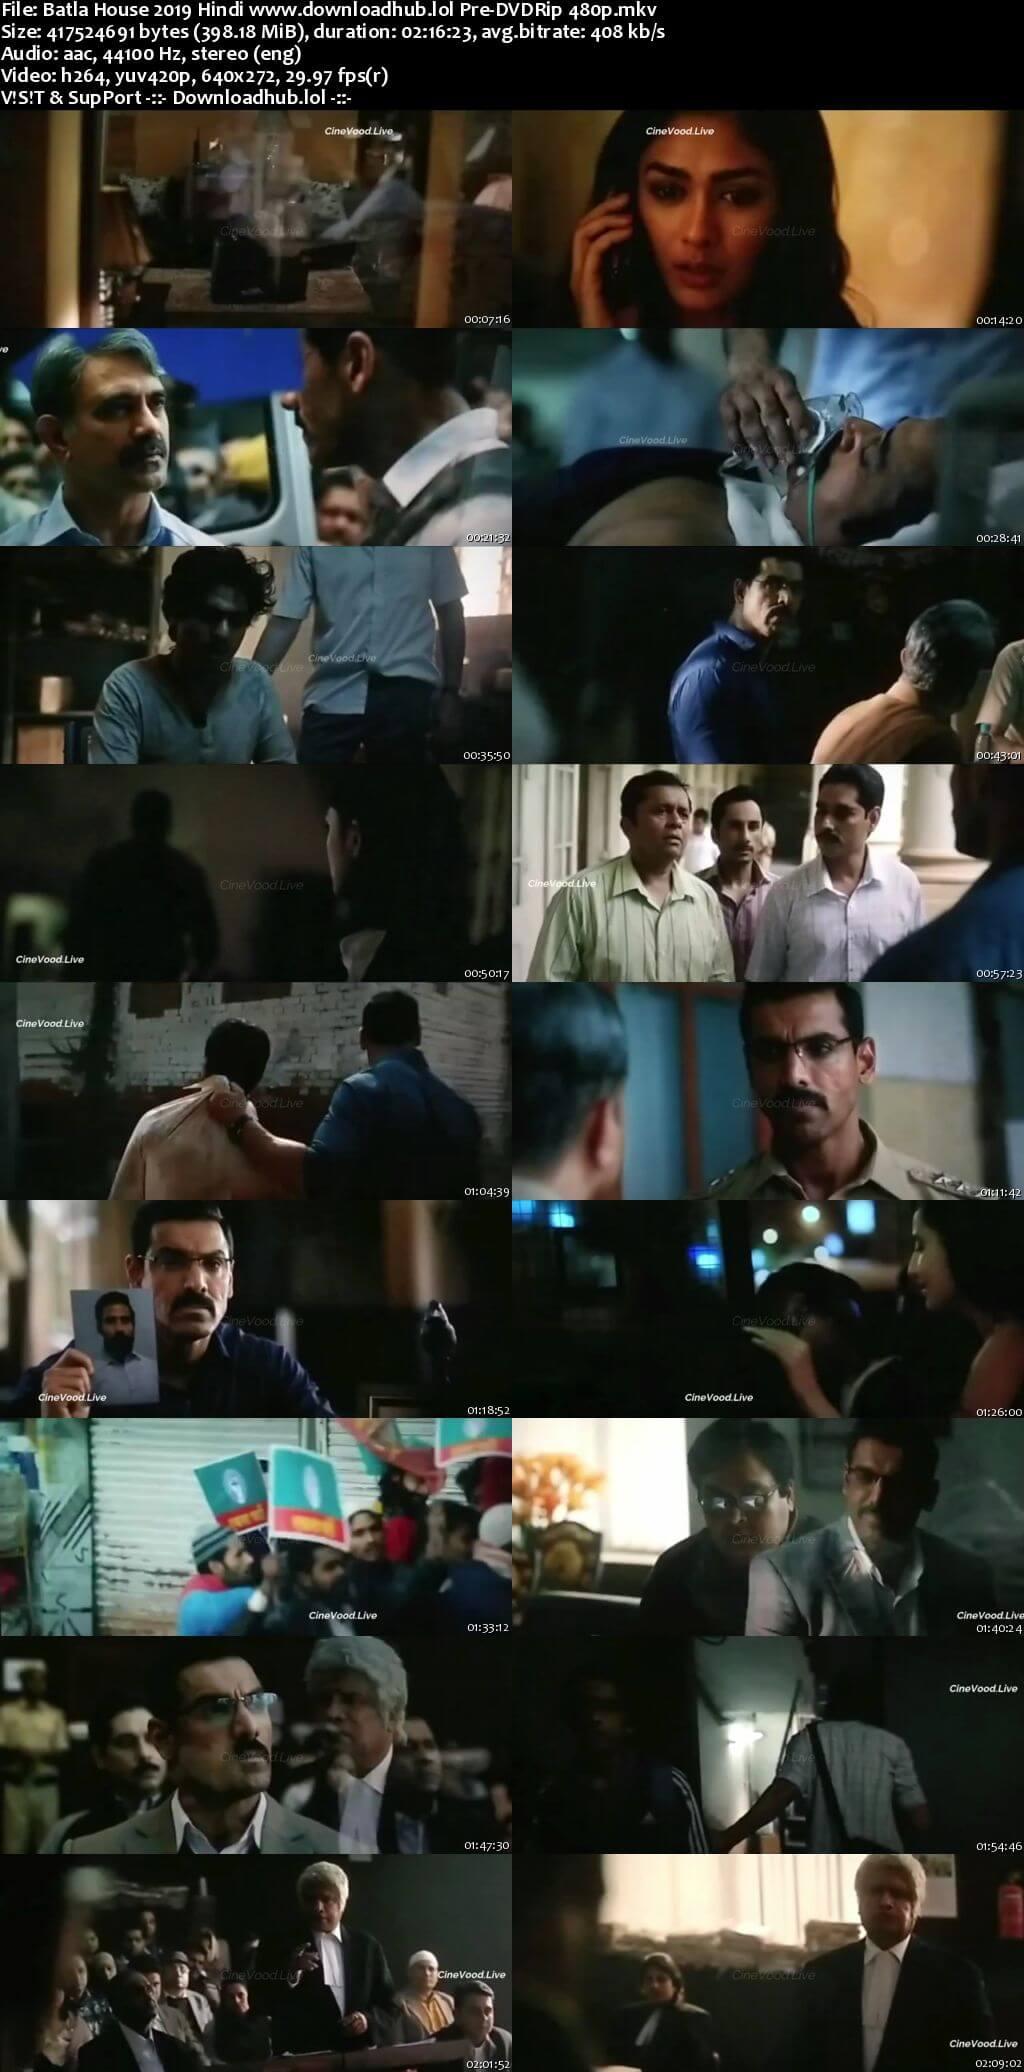 Batla House 2019 Hindi 400MB Pre-DVDRip 480p